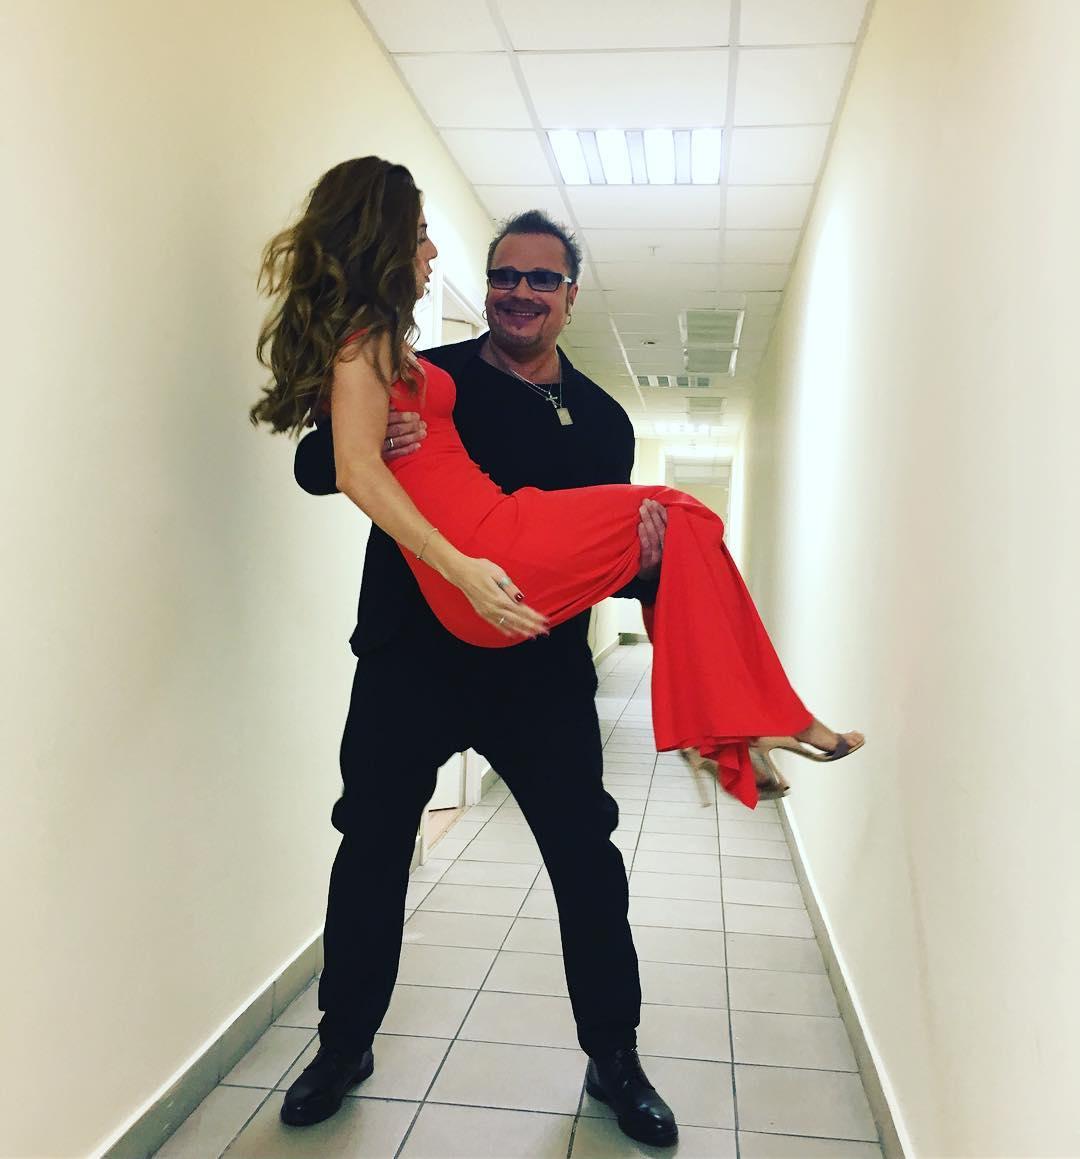 Фотофакт: Владимир Пресняков носит любимую жену на руках